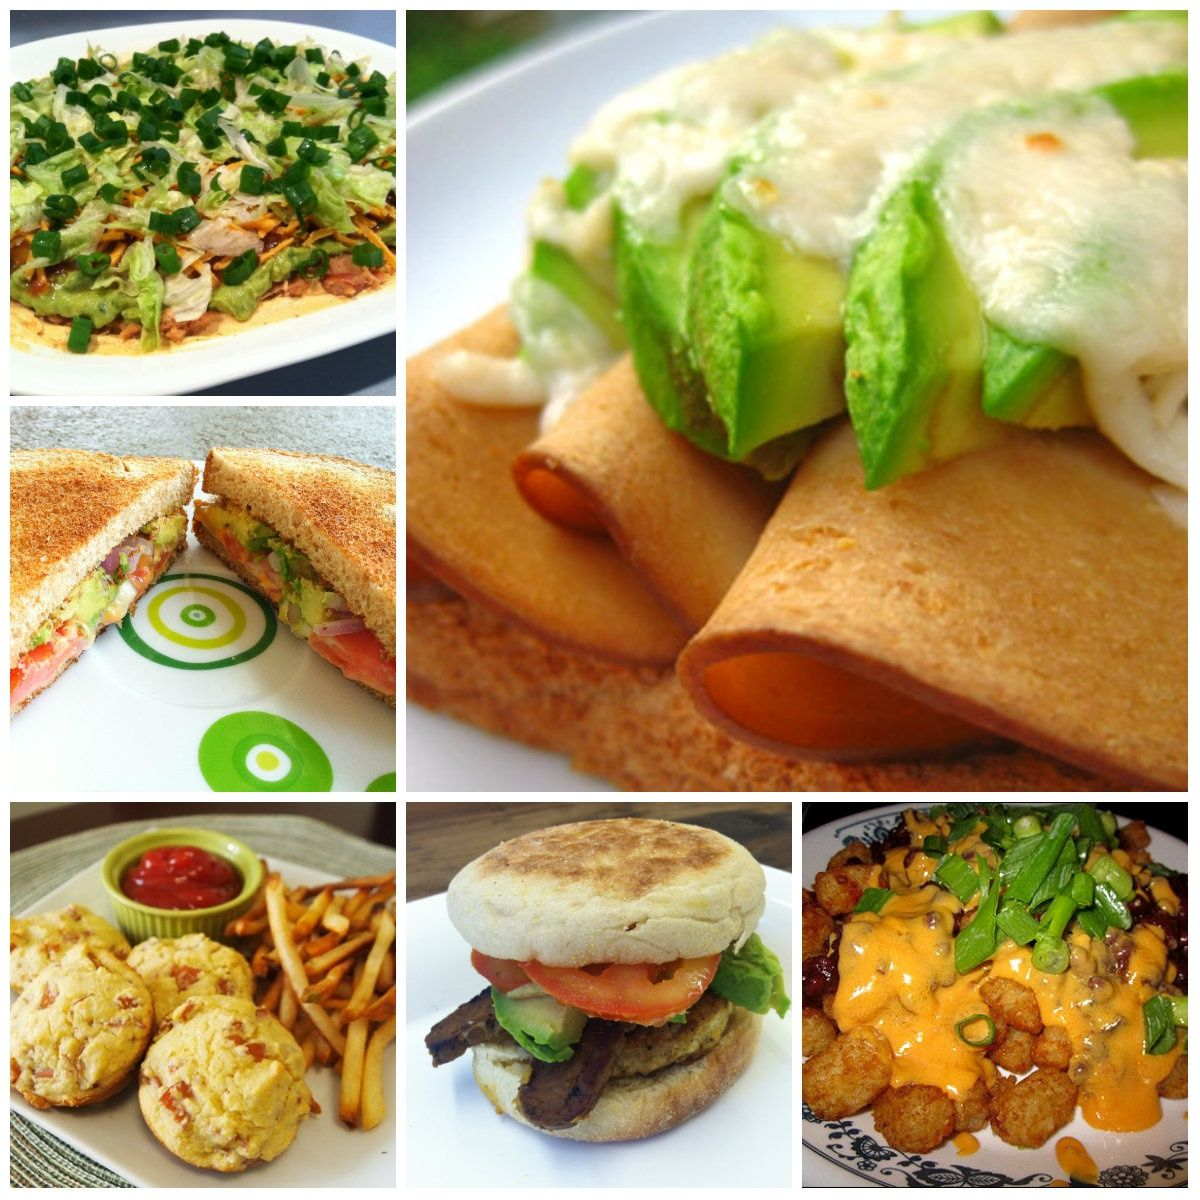 Cool vegan recipe sites food photo vegans and recipes cool vegan recipe sites forumfinder Choice Image